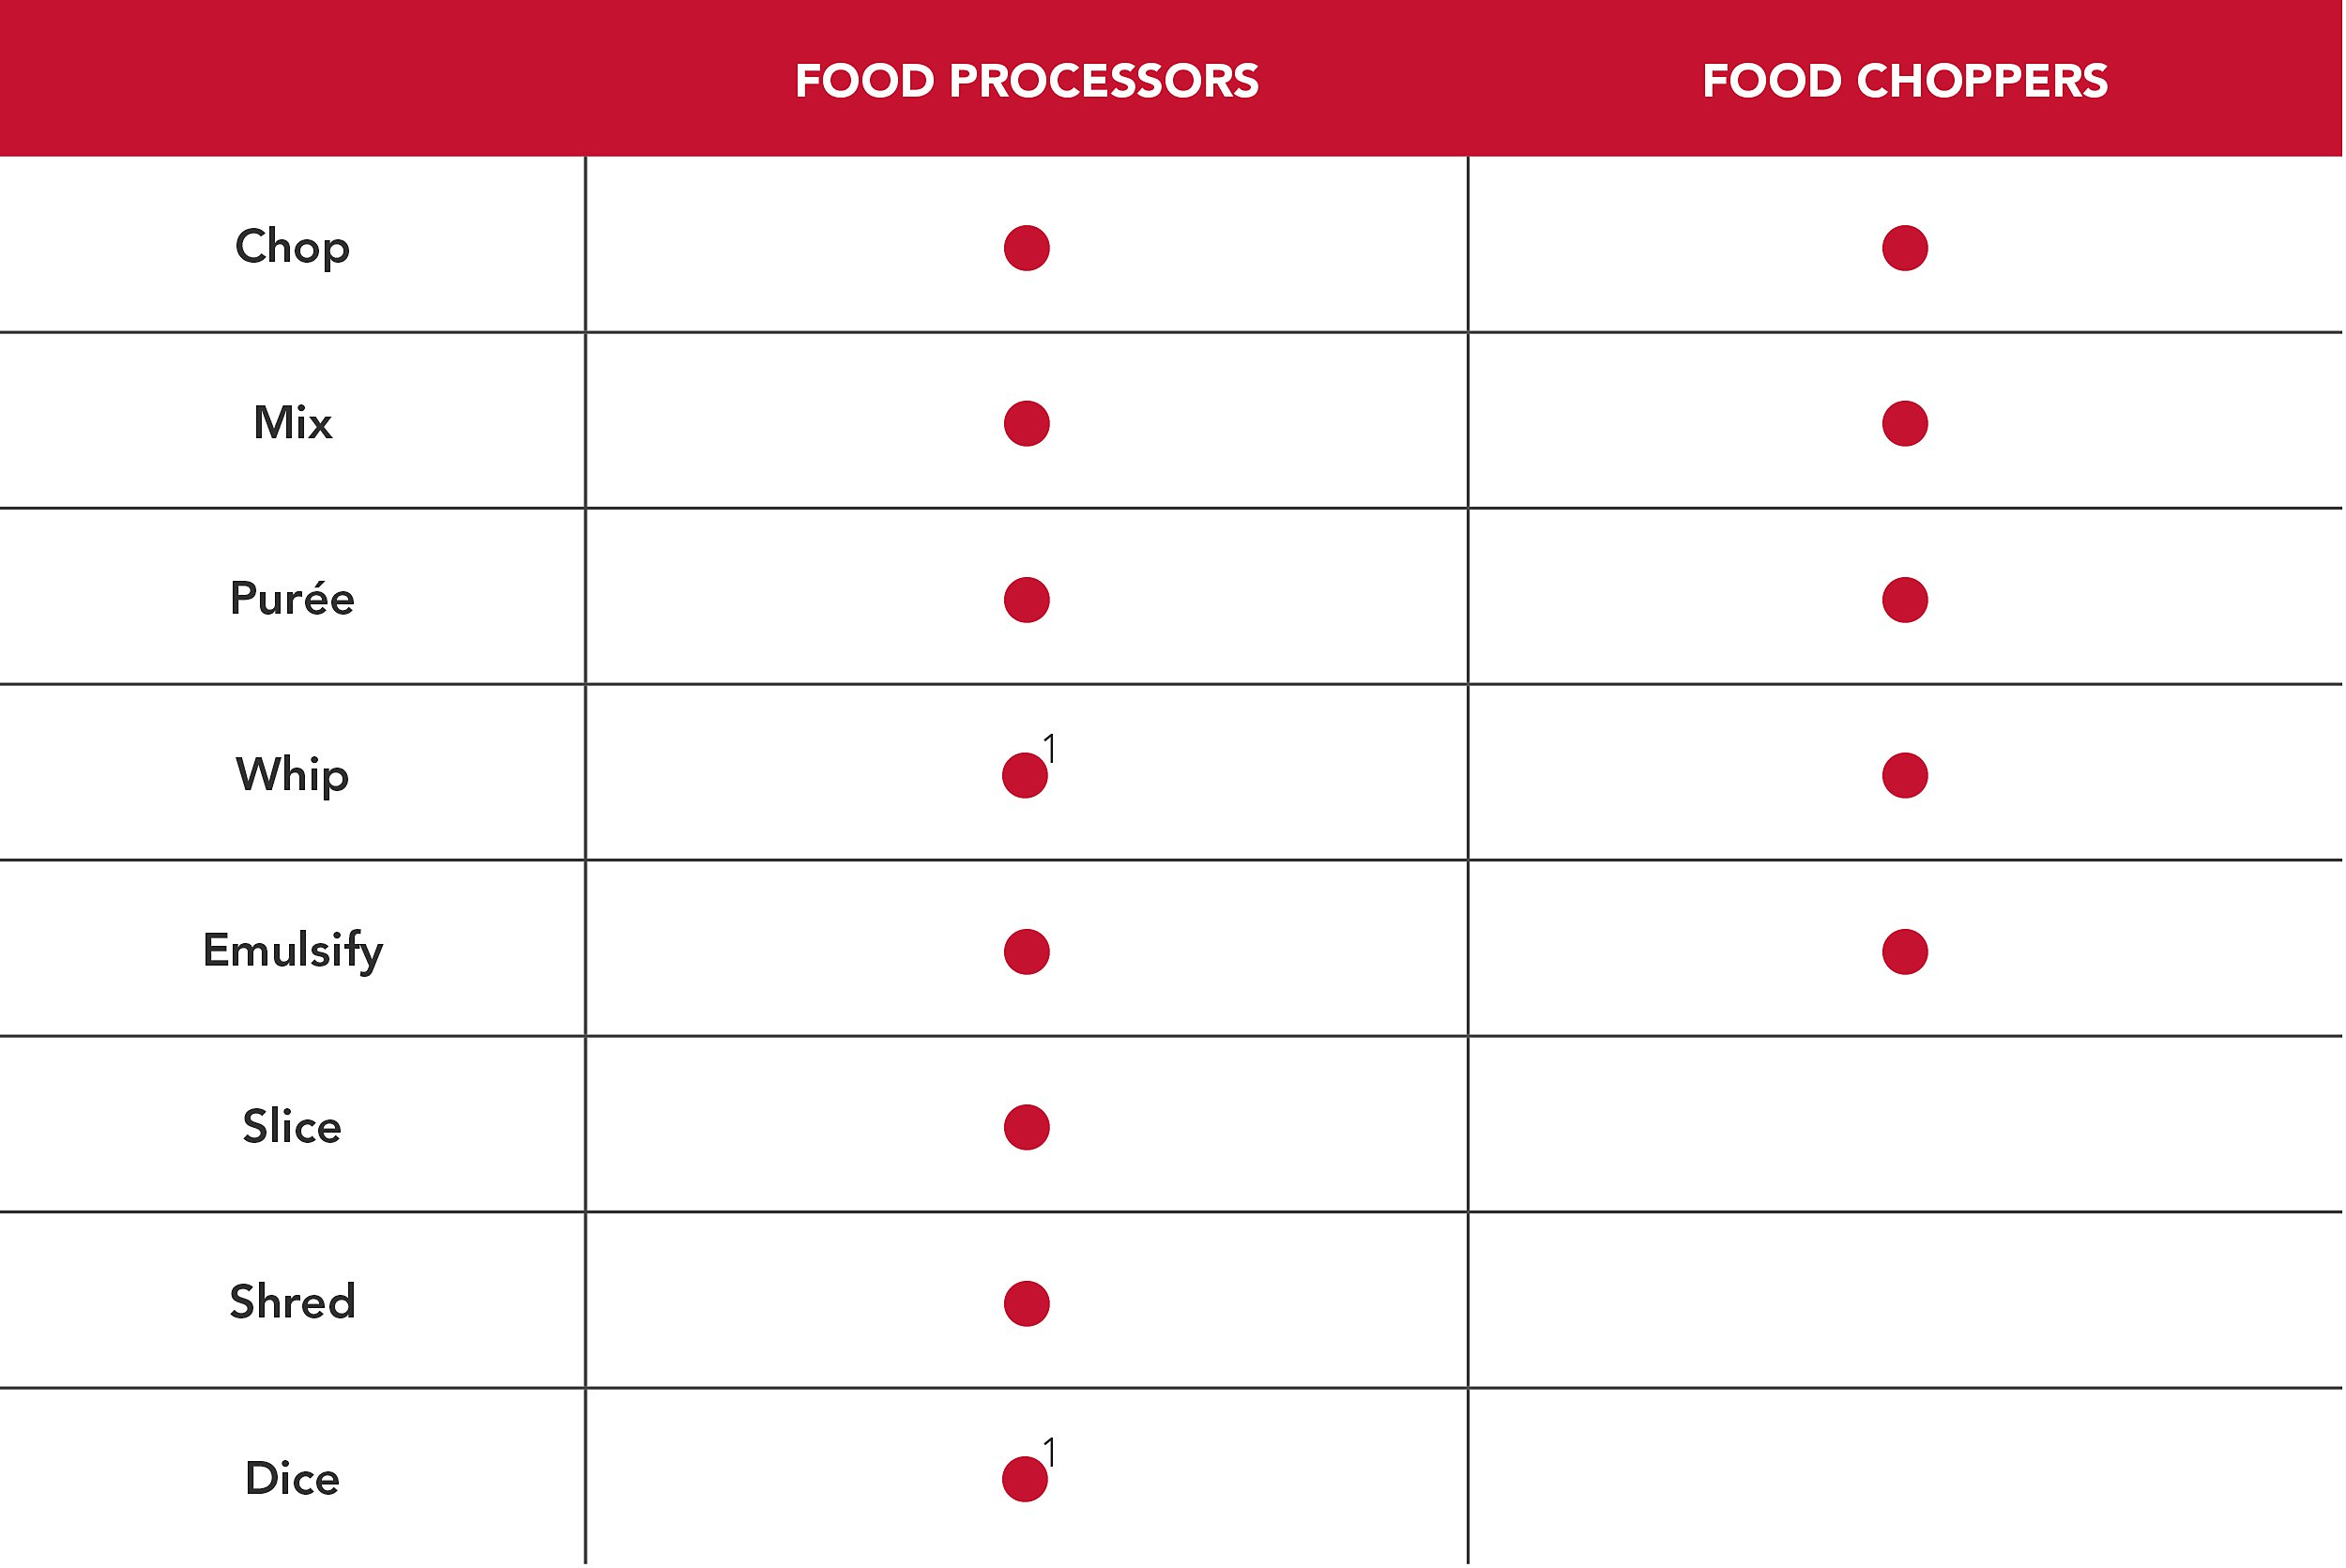 Food processor vs food chopper chart